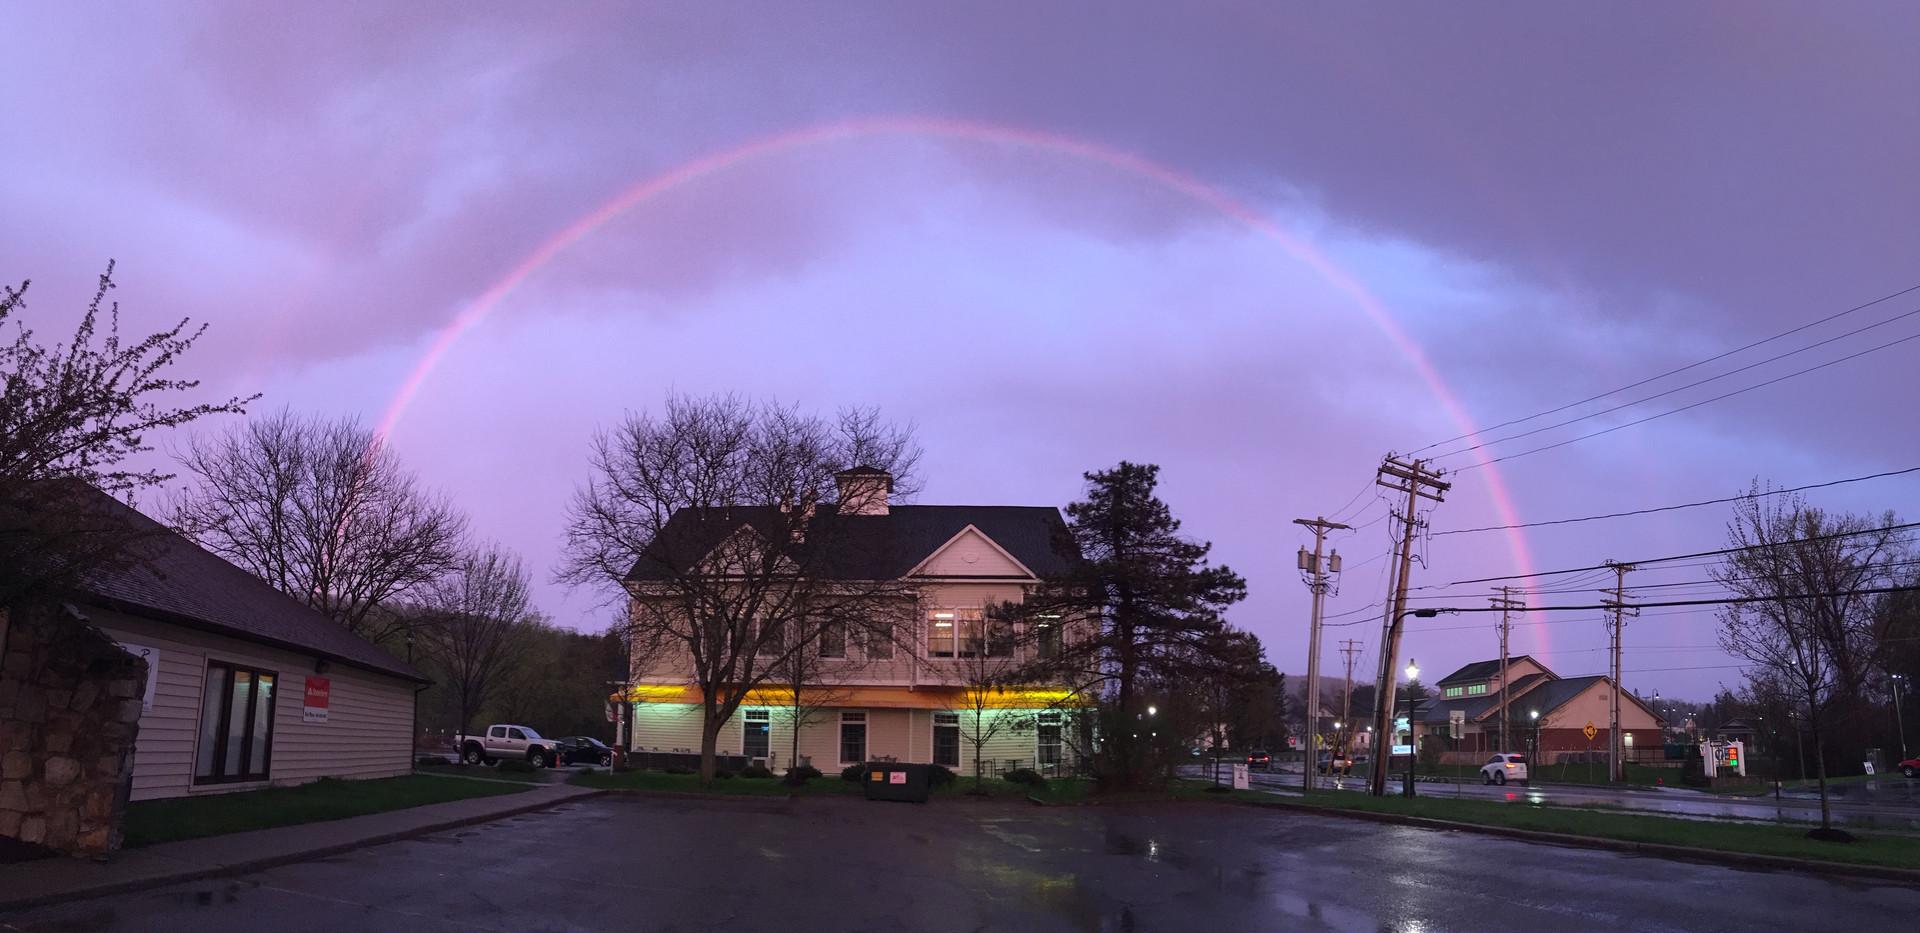 Rainbow over studio on last day of Yoga class.